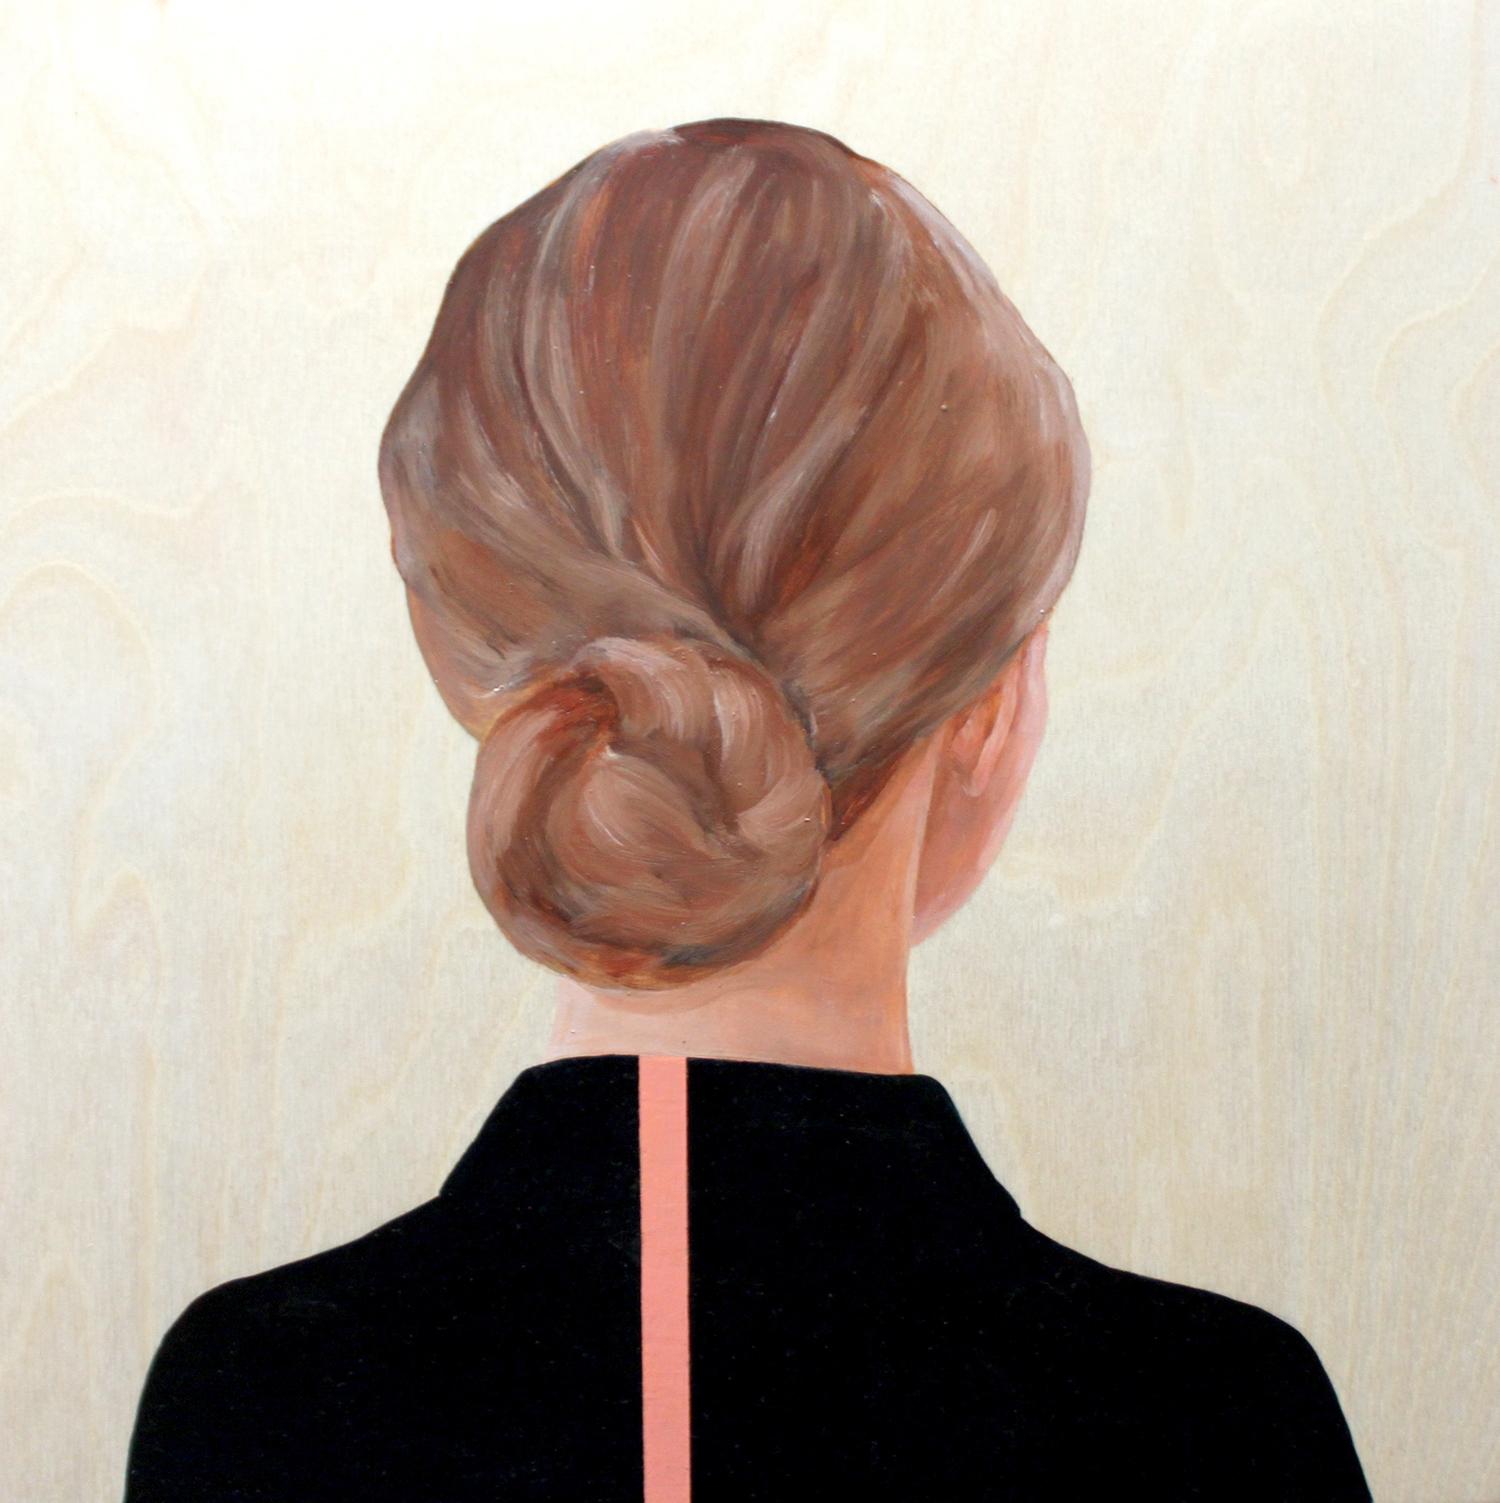 Girl in Black Shirt with Pink Stripe  by Marina  Nazarova